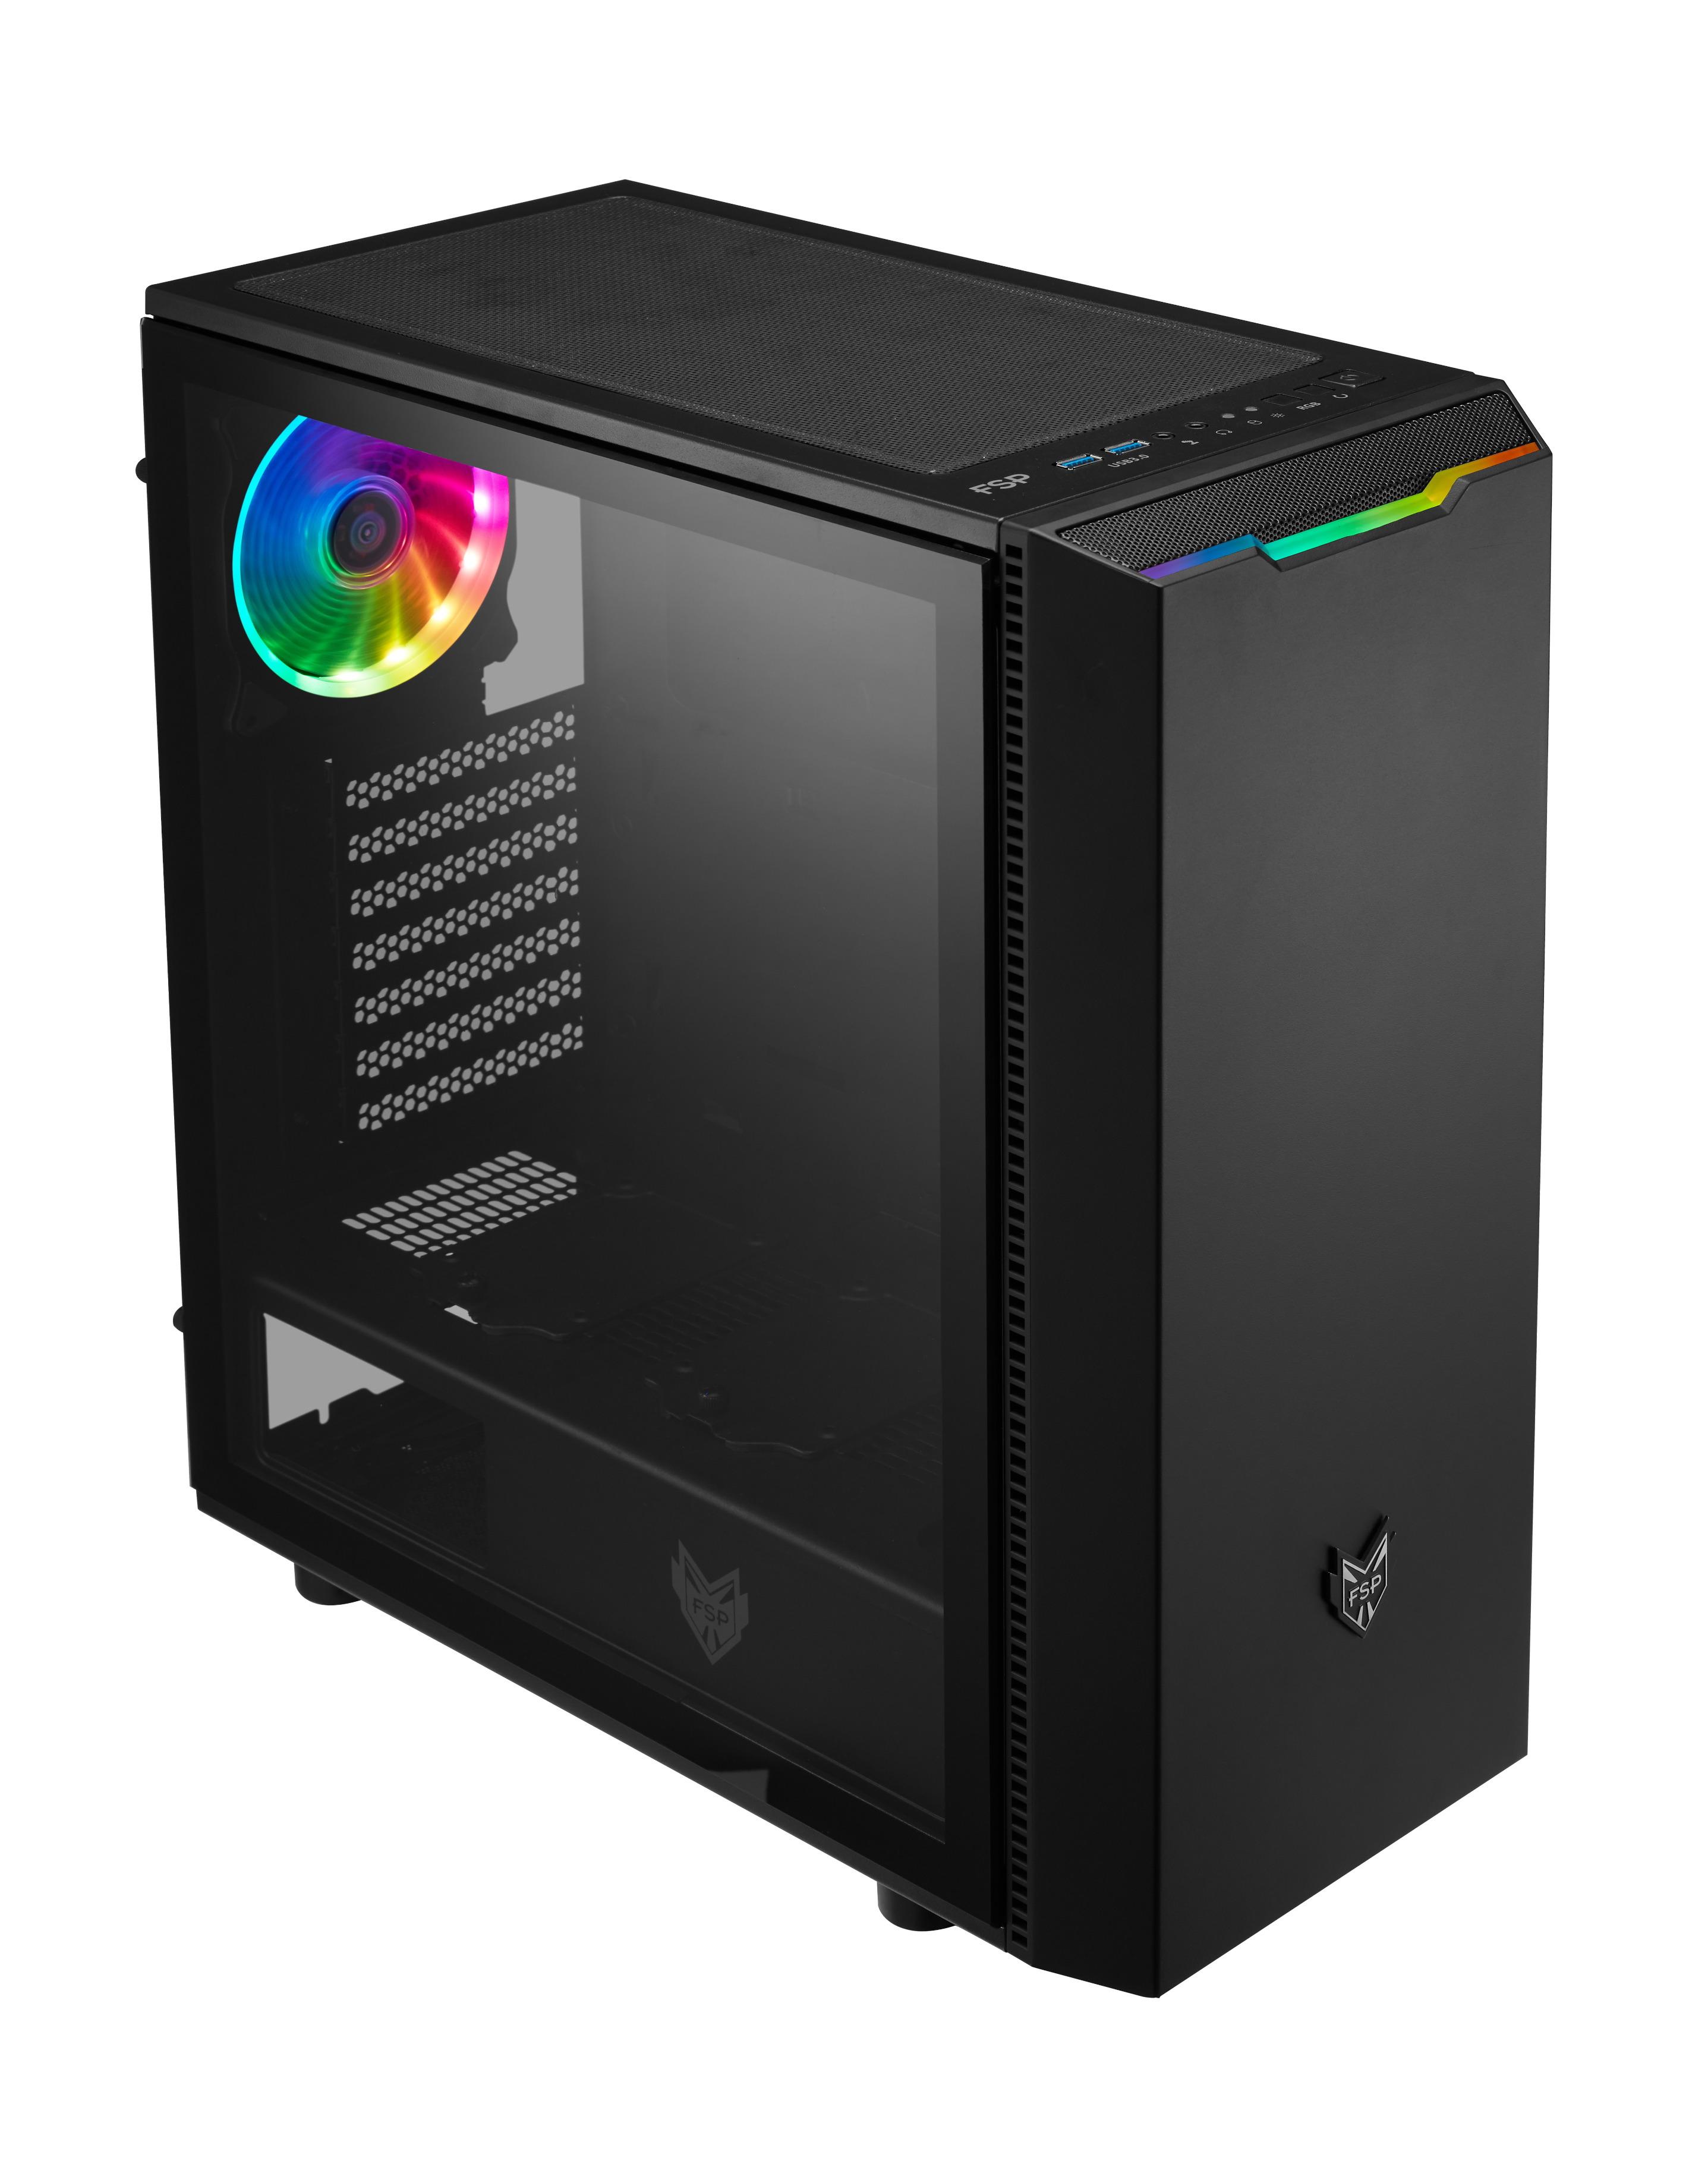 FSP/Fortron ATX Midi Tower CMT350 Black, průhledná bočnice, 1 x A. RGB LED 120 mm ventilátor - POC0000068